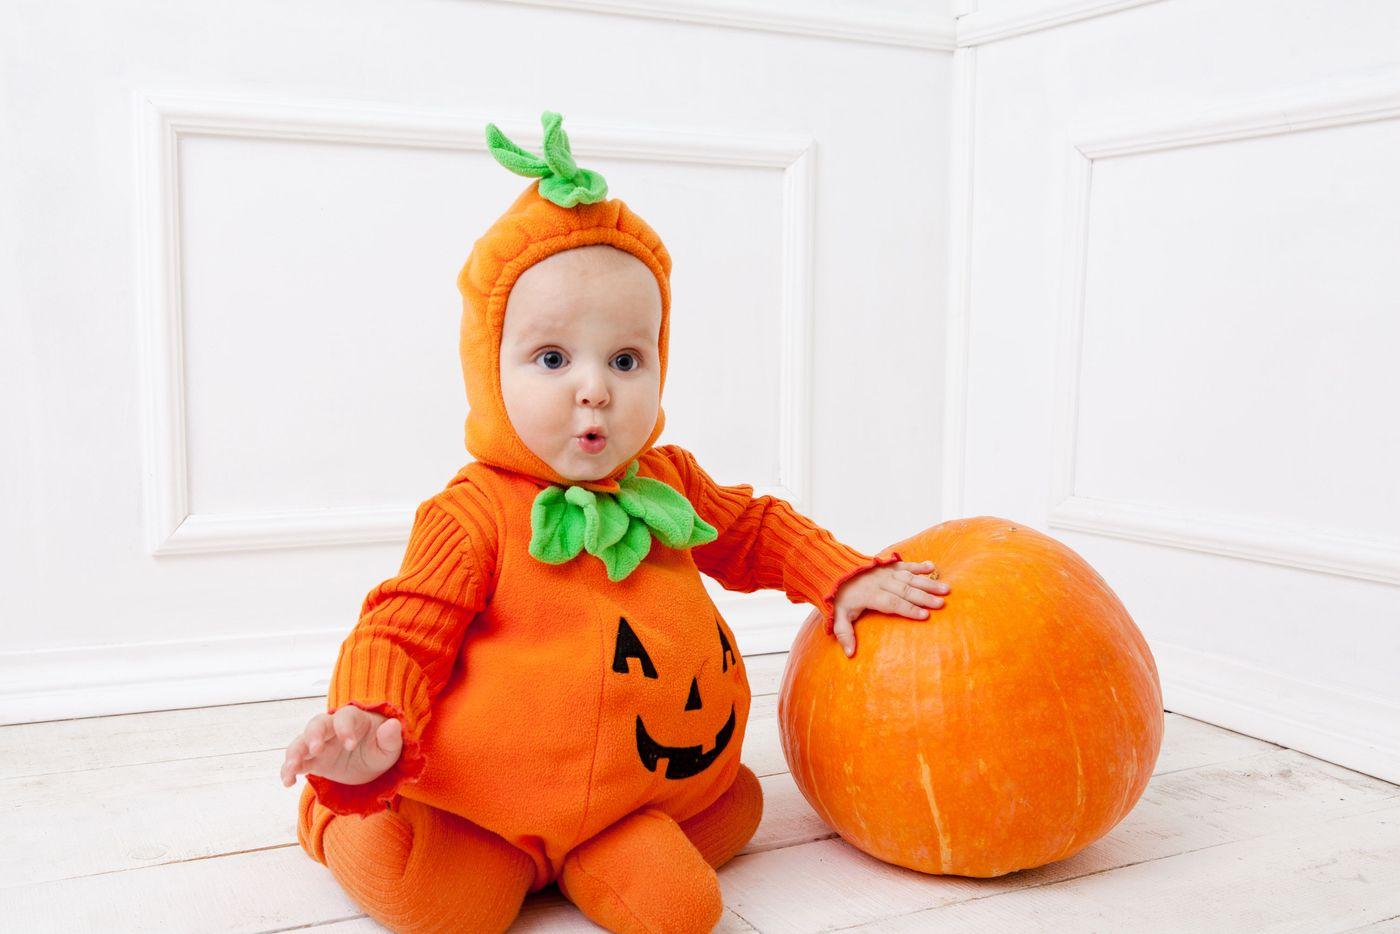 Baby Halloween Pumpkin.The Best Halloween Costume In Which To Dress Your Baby